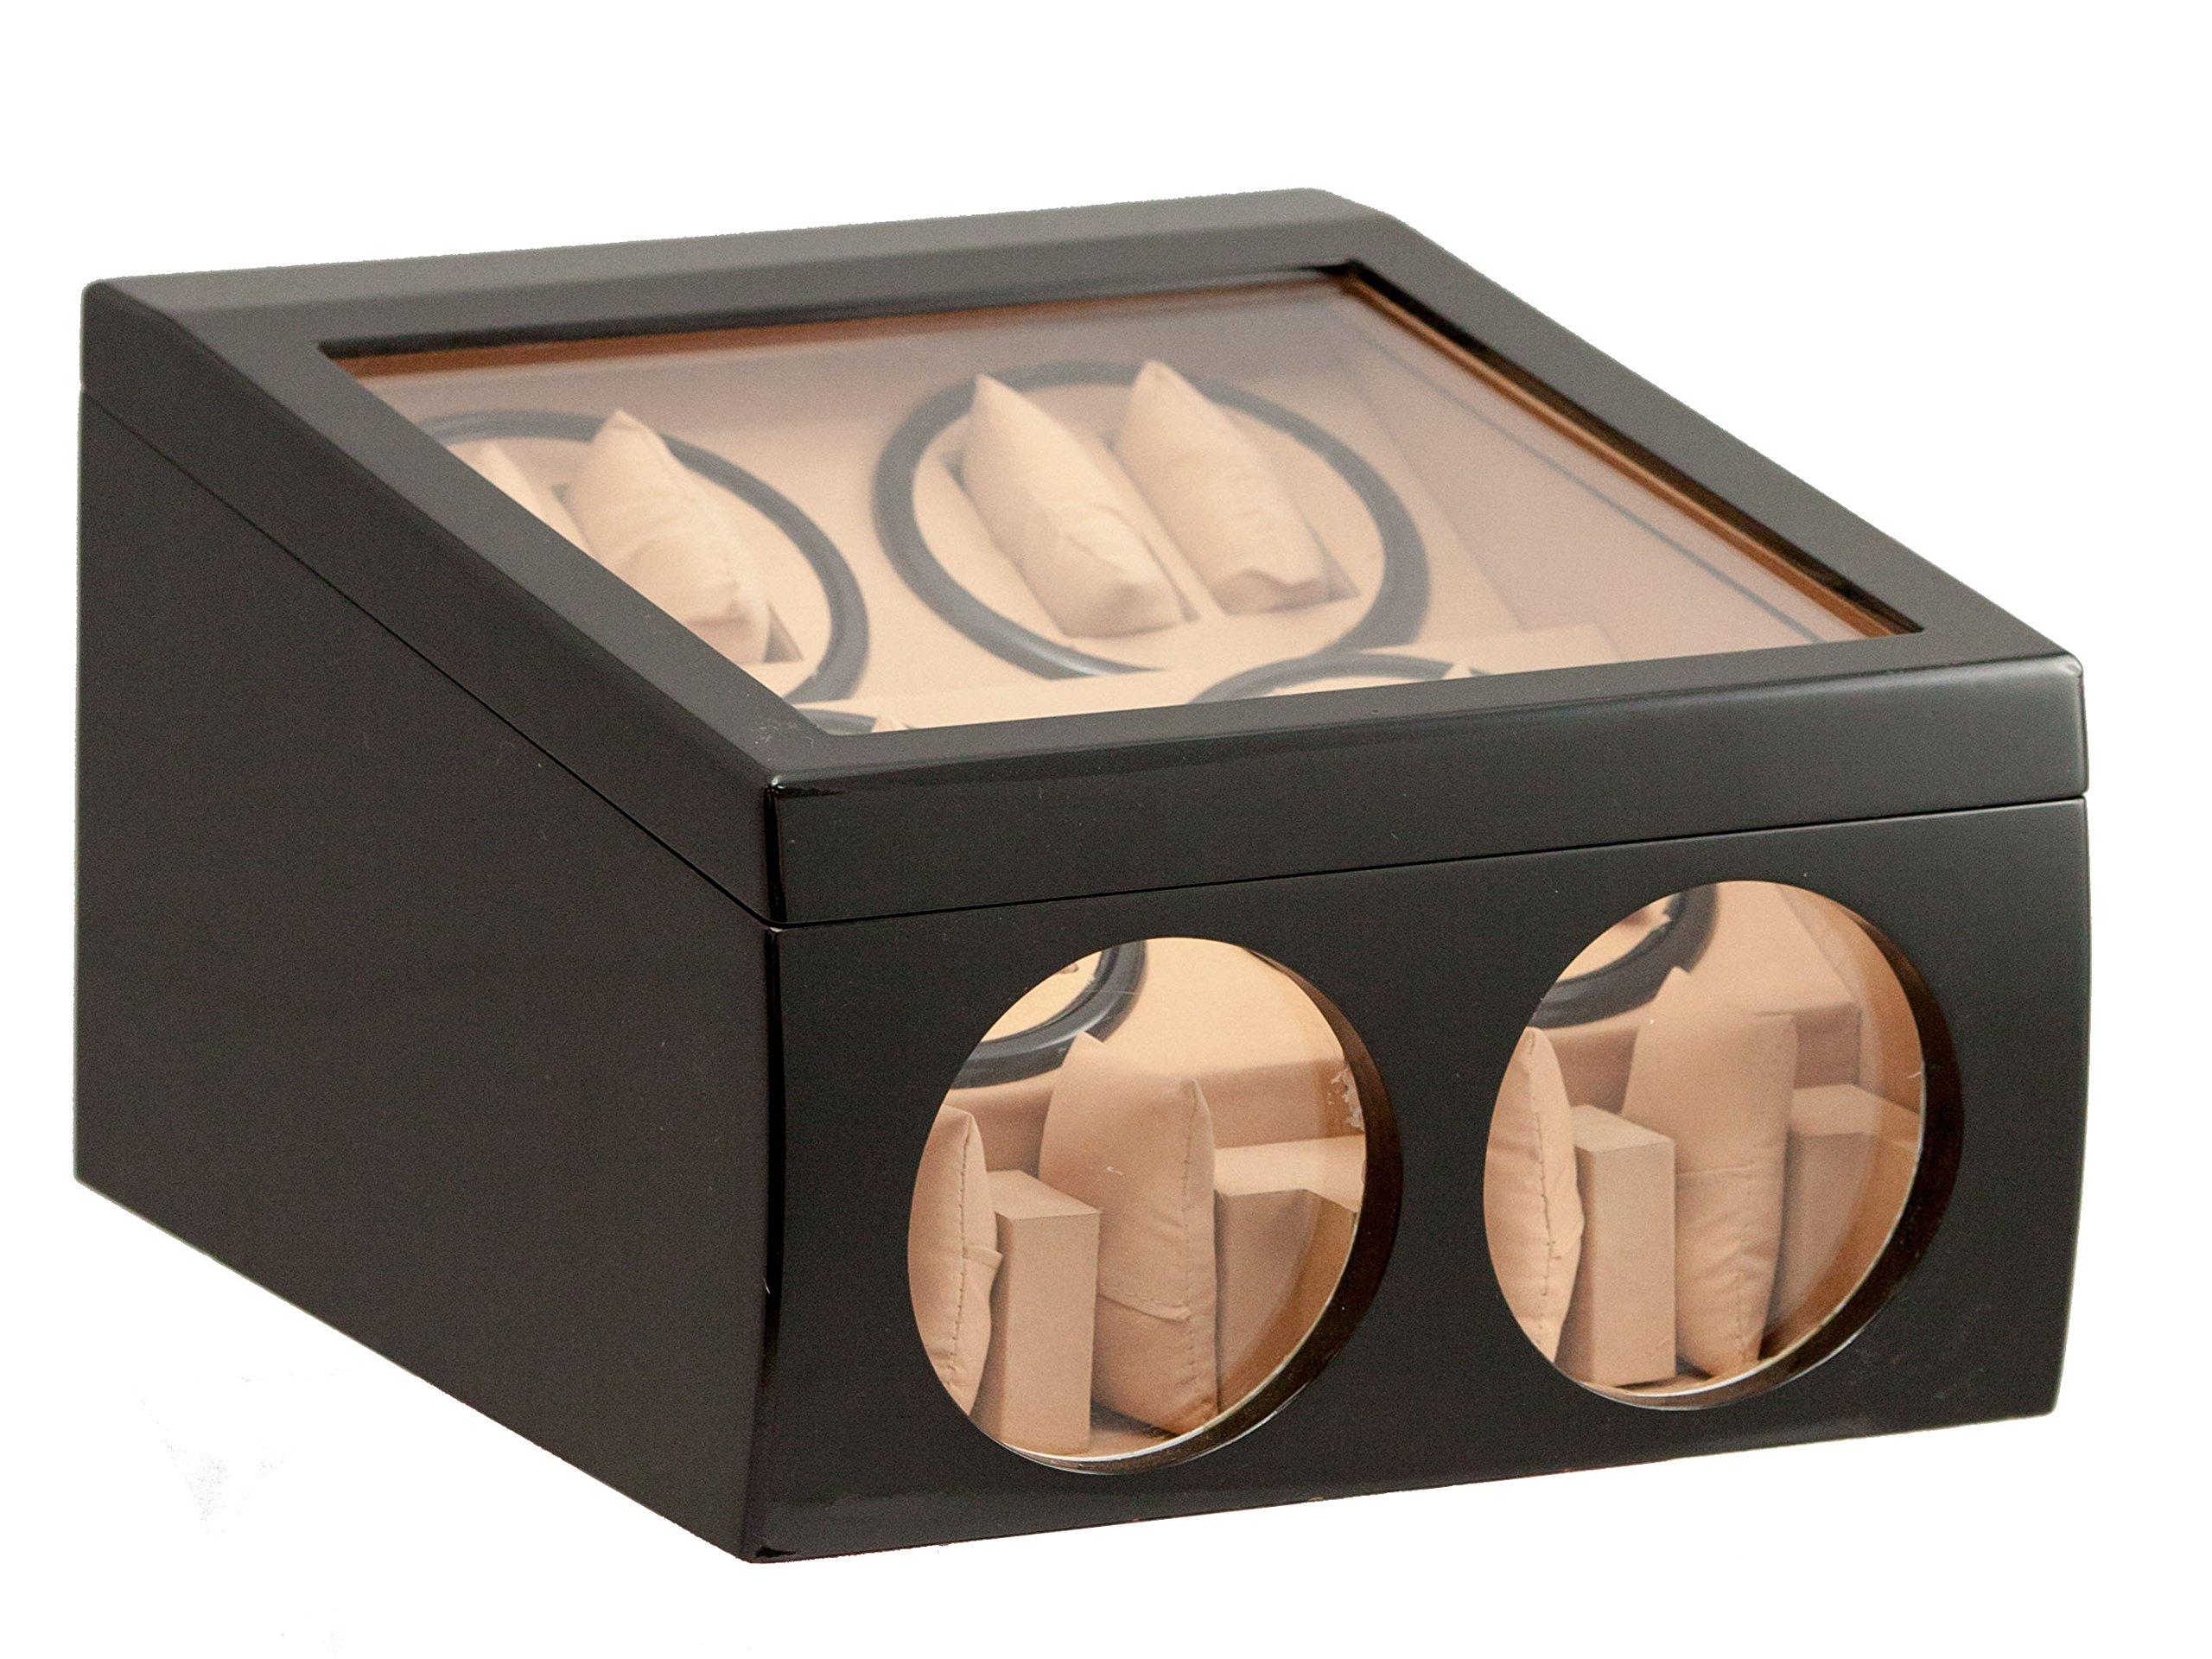 BRAND NEW BLACK 8+4 AUTOMATIC DUAL / DOUBLE QUAD WATCH WINDER 4 DISPLAY STORAGE BOX CASE